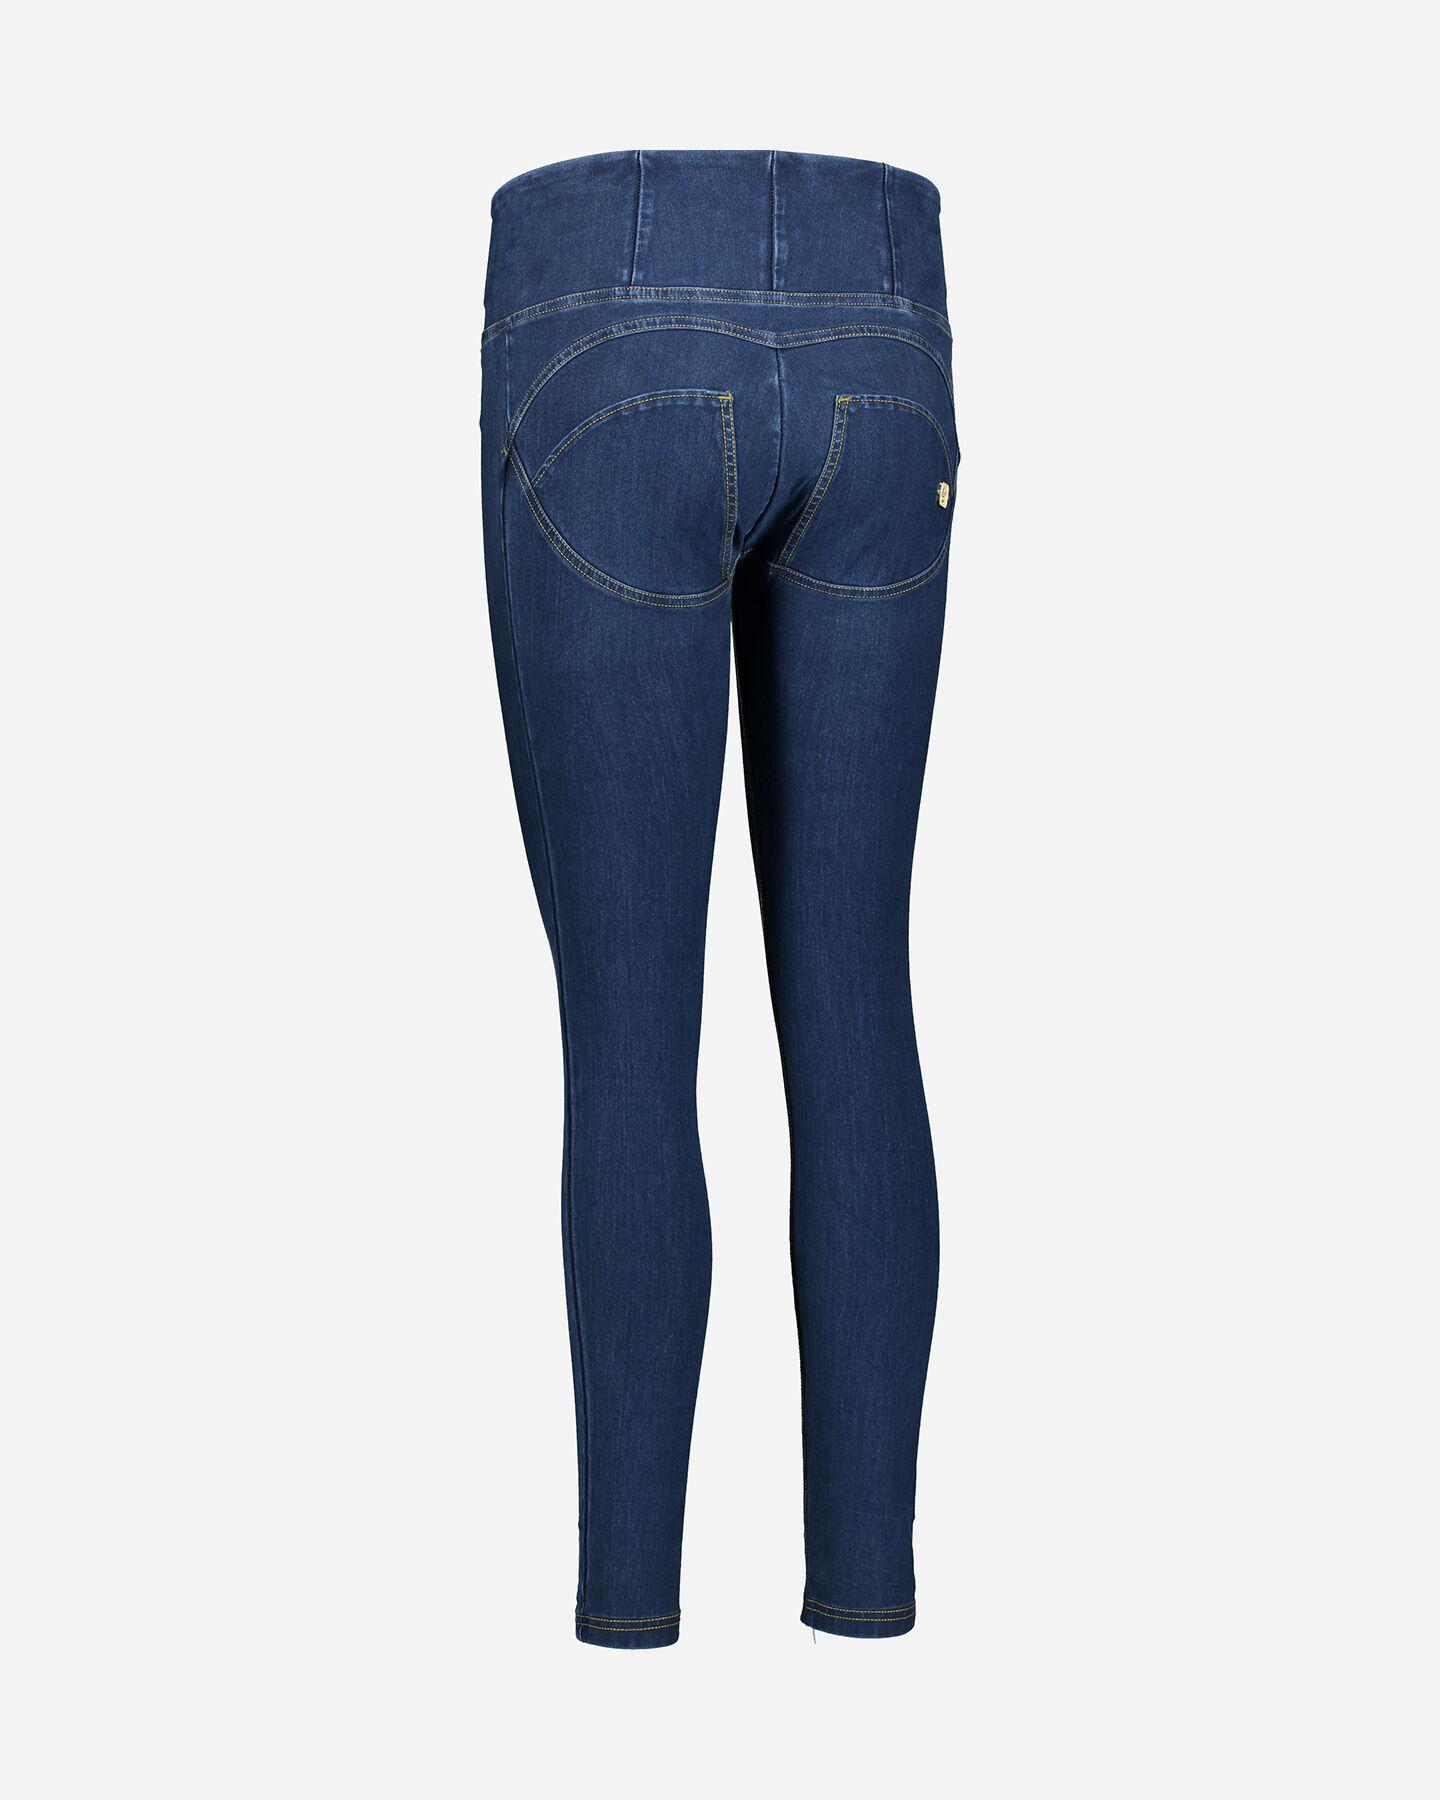 Pantalone FREDDY HIGH WAIST NOW WRUP W S5222756 scatto 2